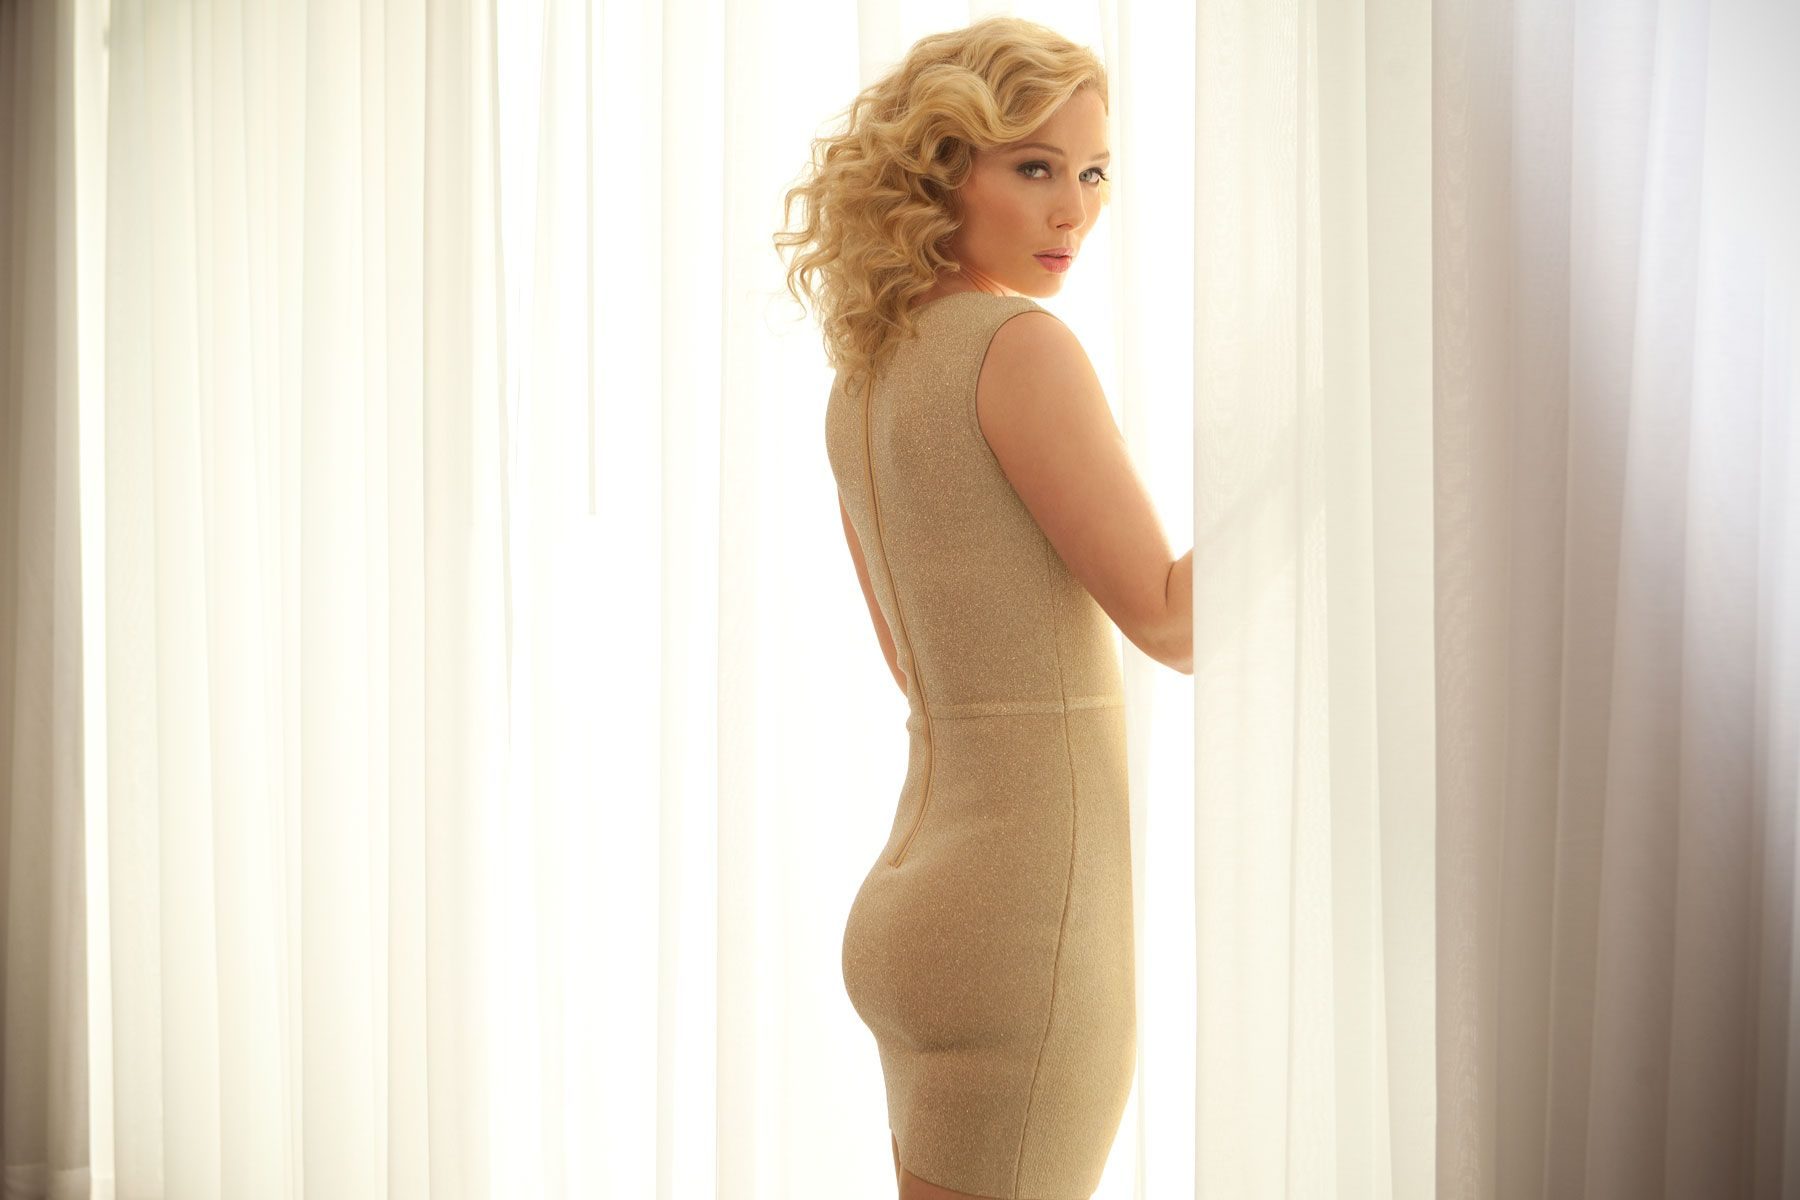 Porno Gina McKee nudes (88 pics) Leaked, iCloud, cleavage